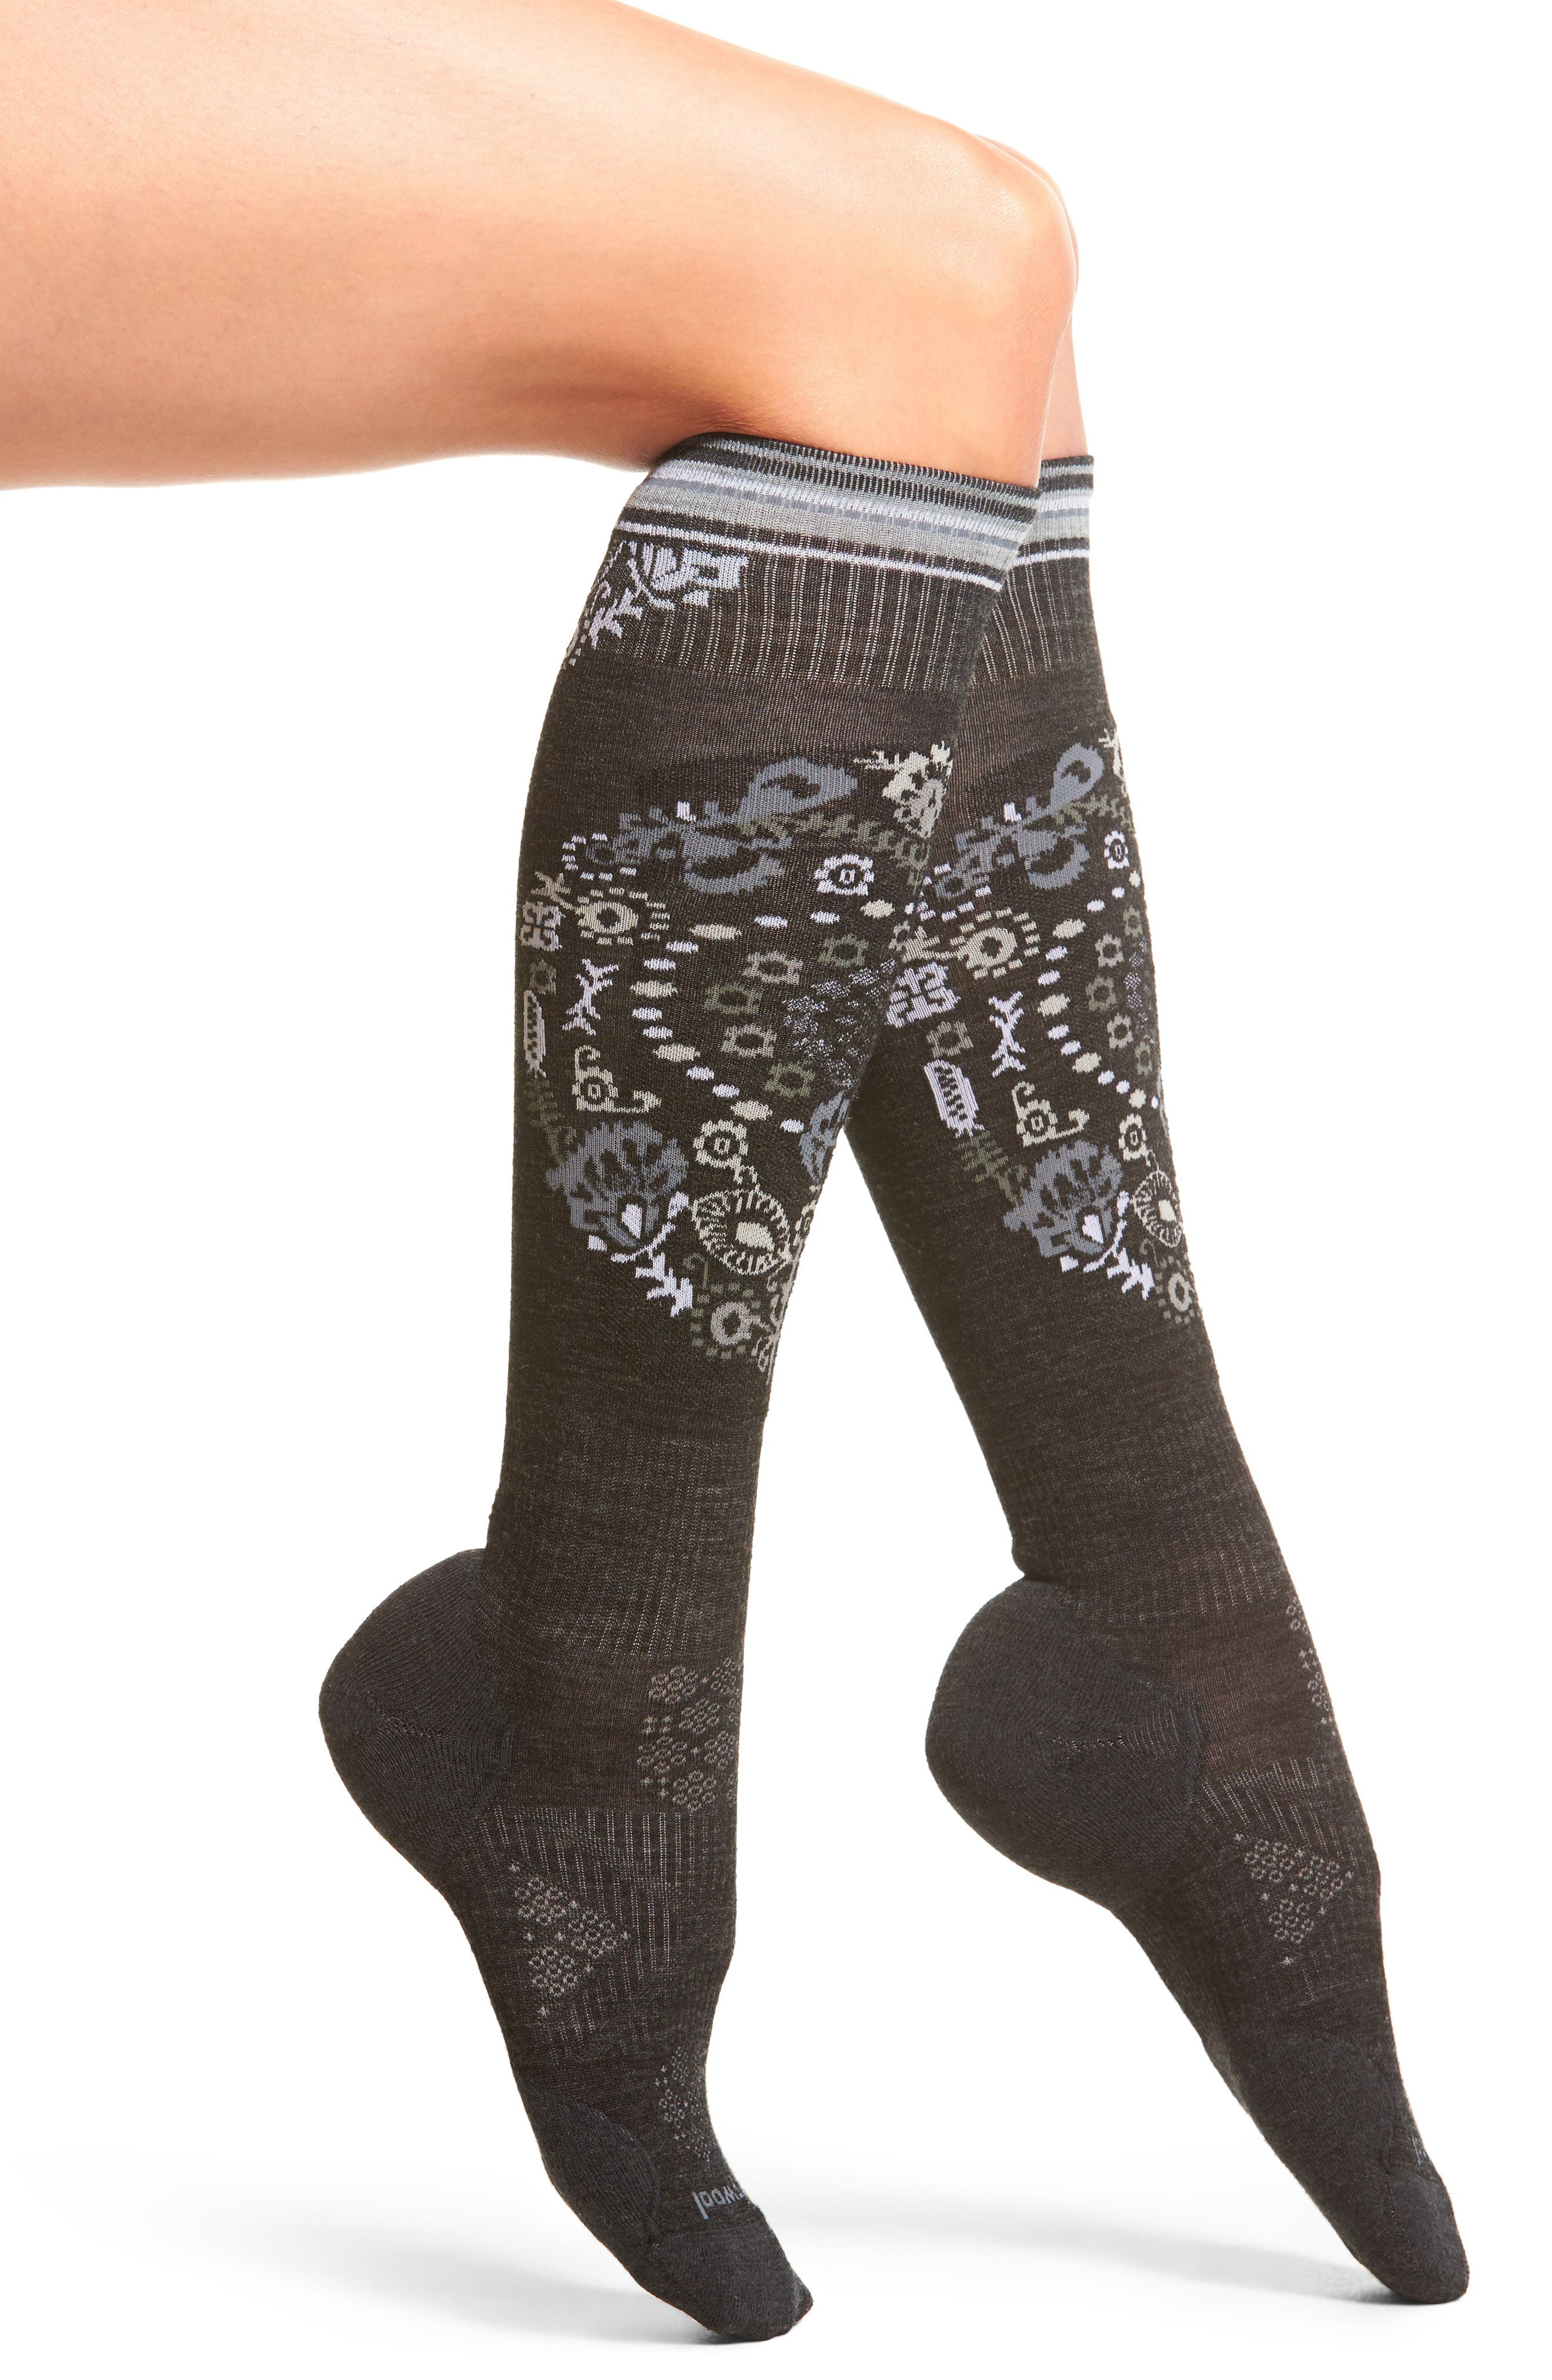 Smartwool PhD® Ski Light Elite Paisley Socks